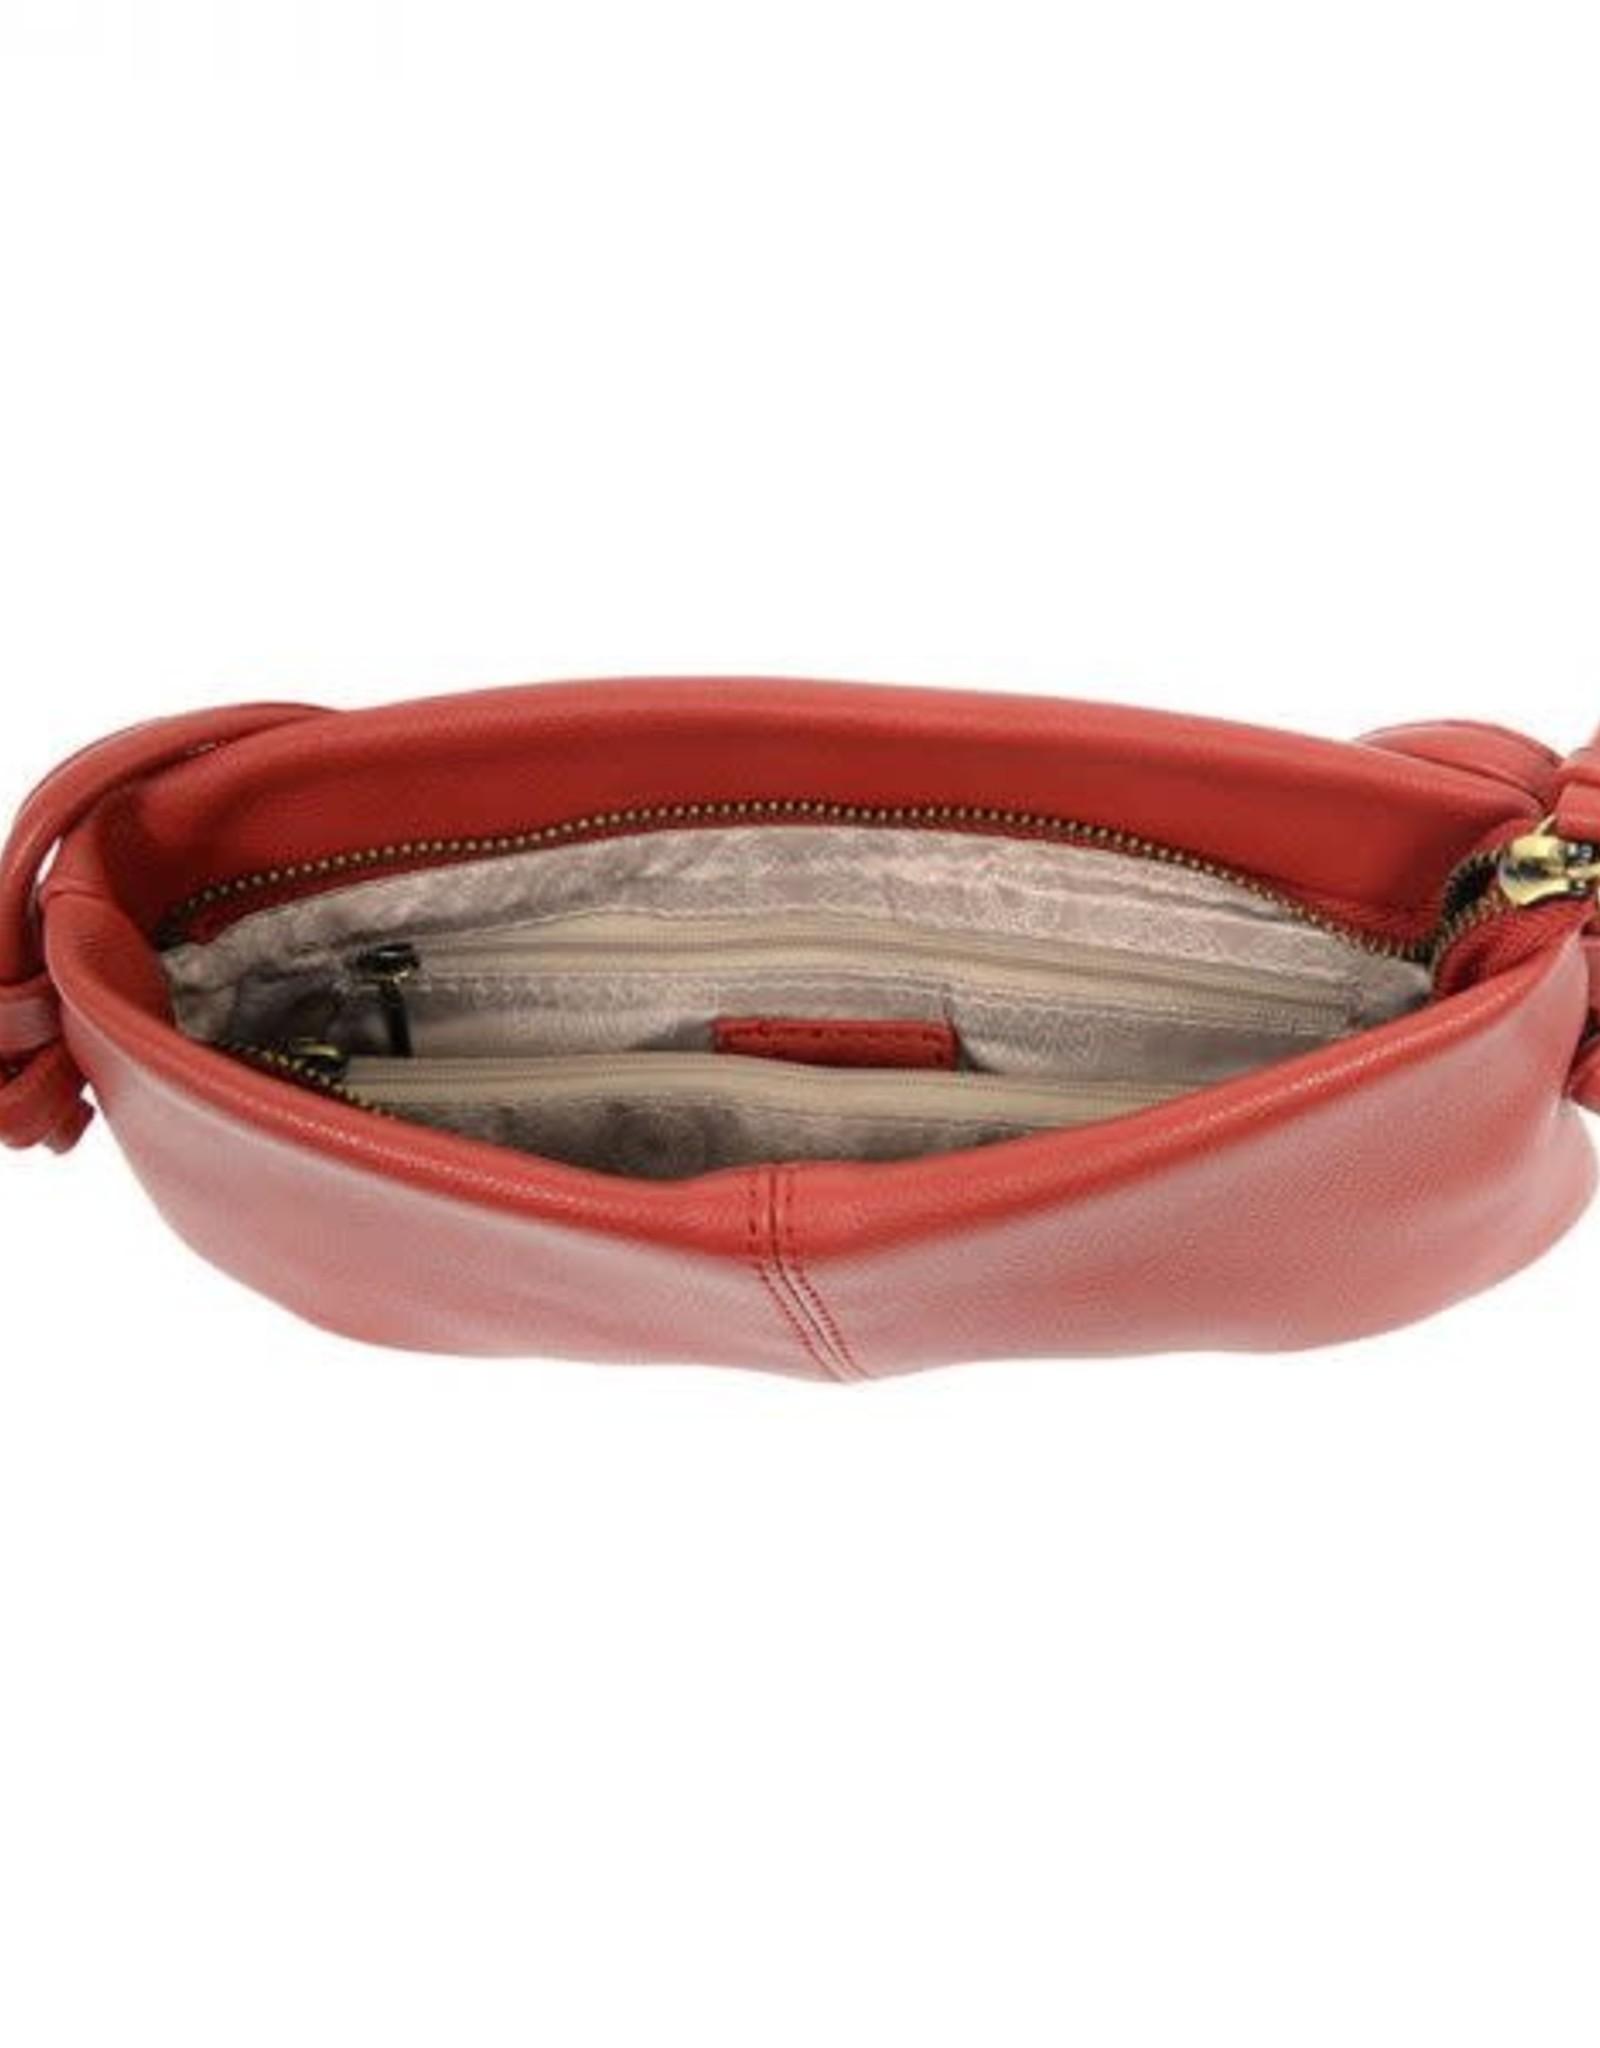 - Red Crossbody Cinch Bag